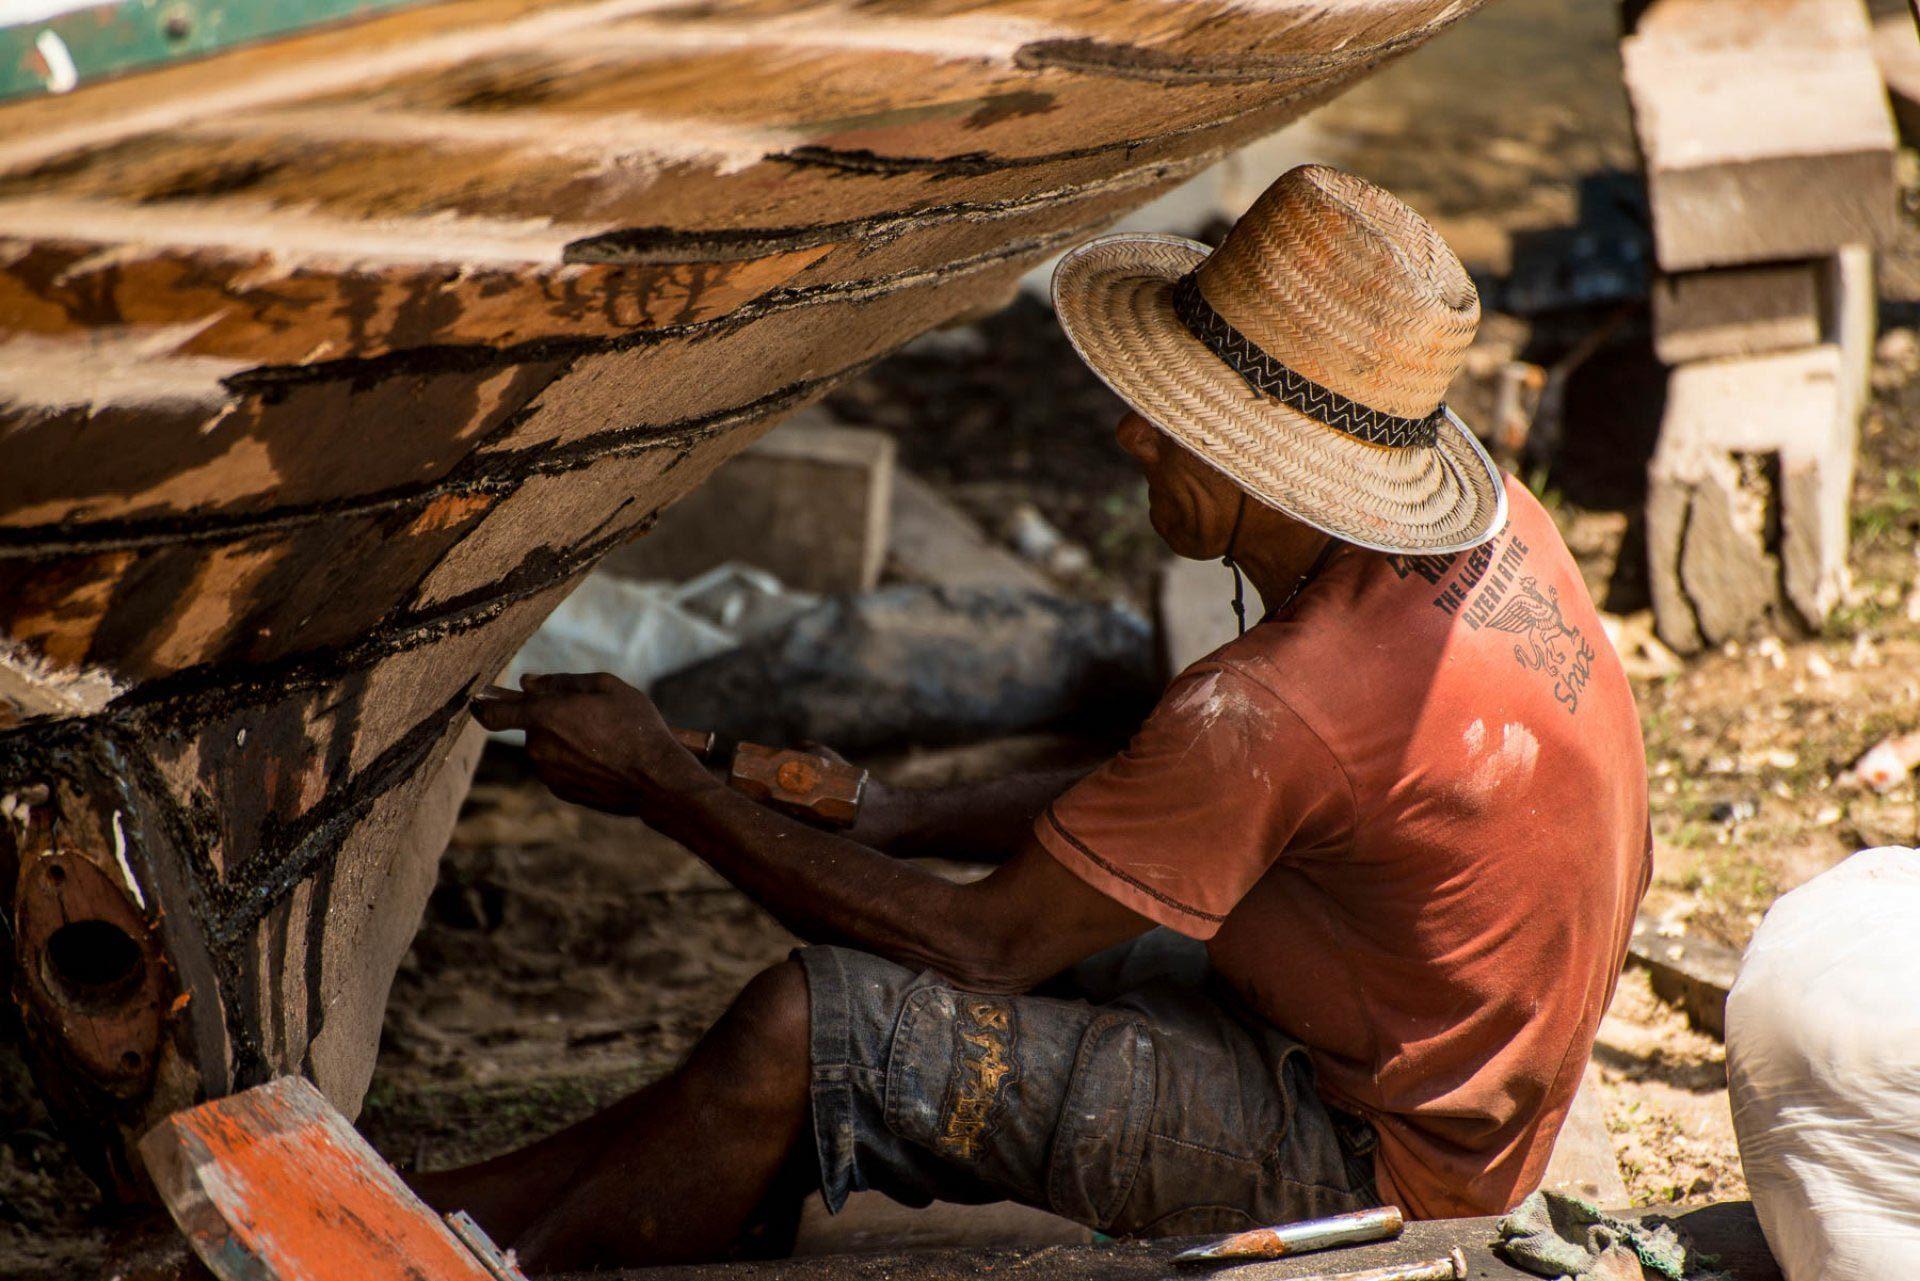 Pescador de Santarém